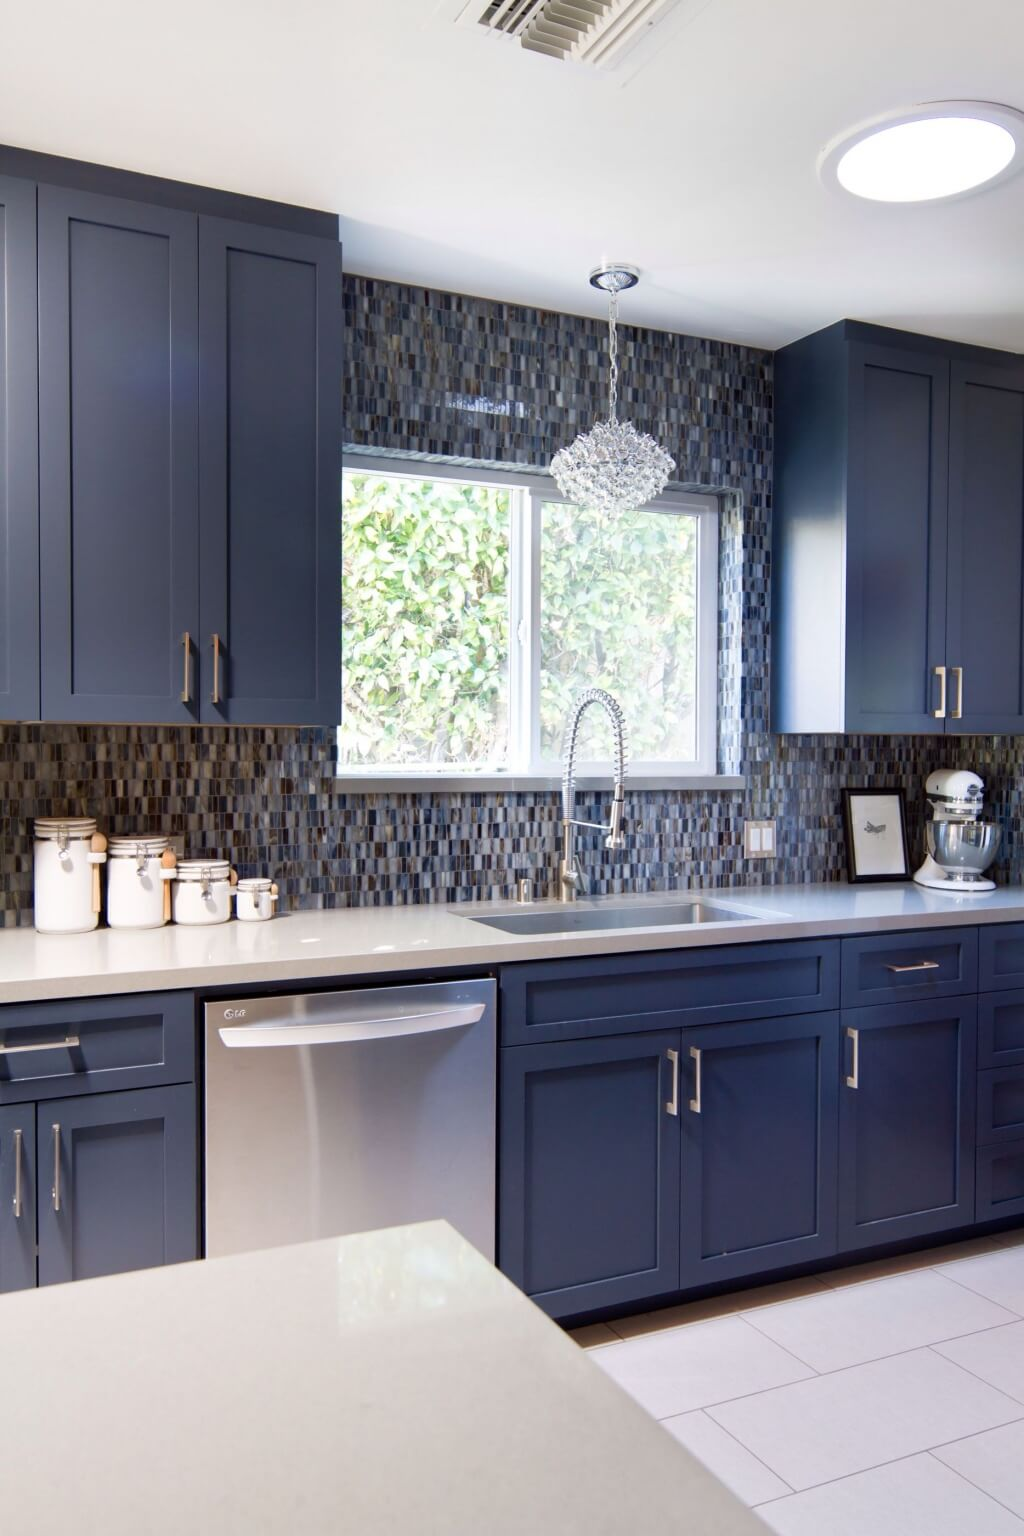 Lively gray kitchen